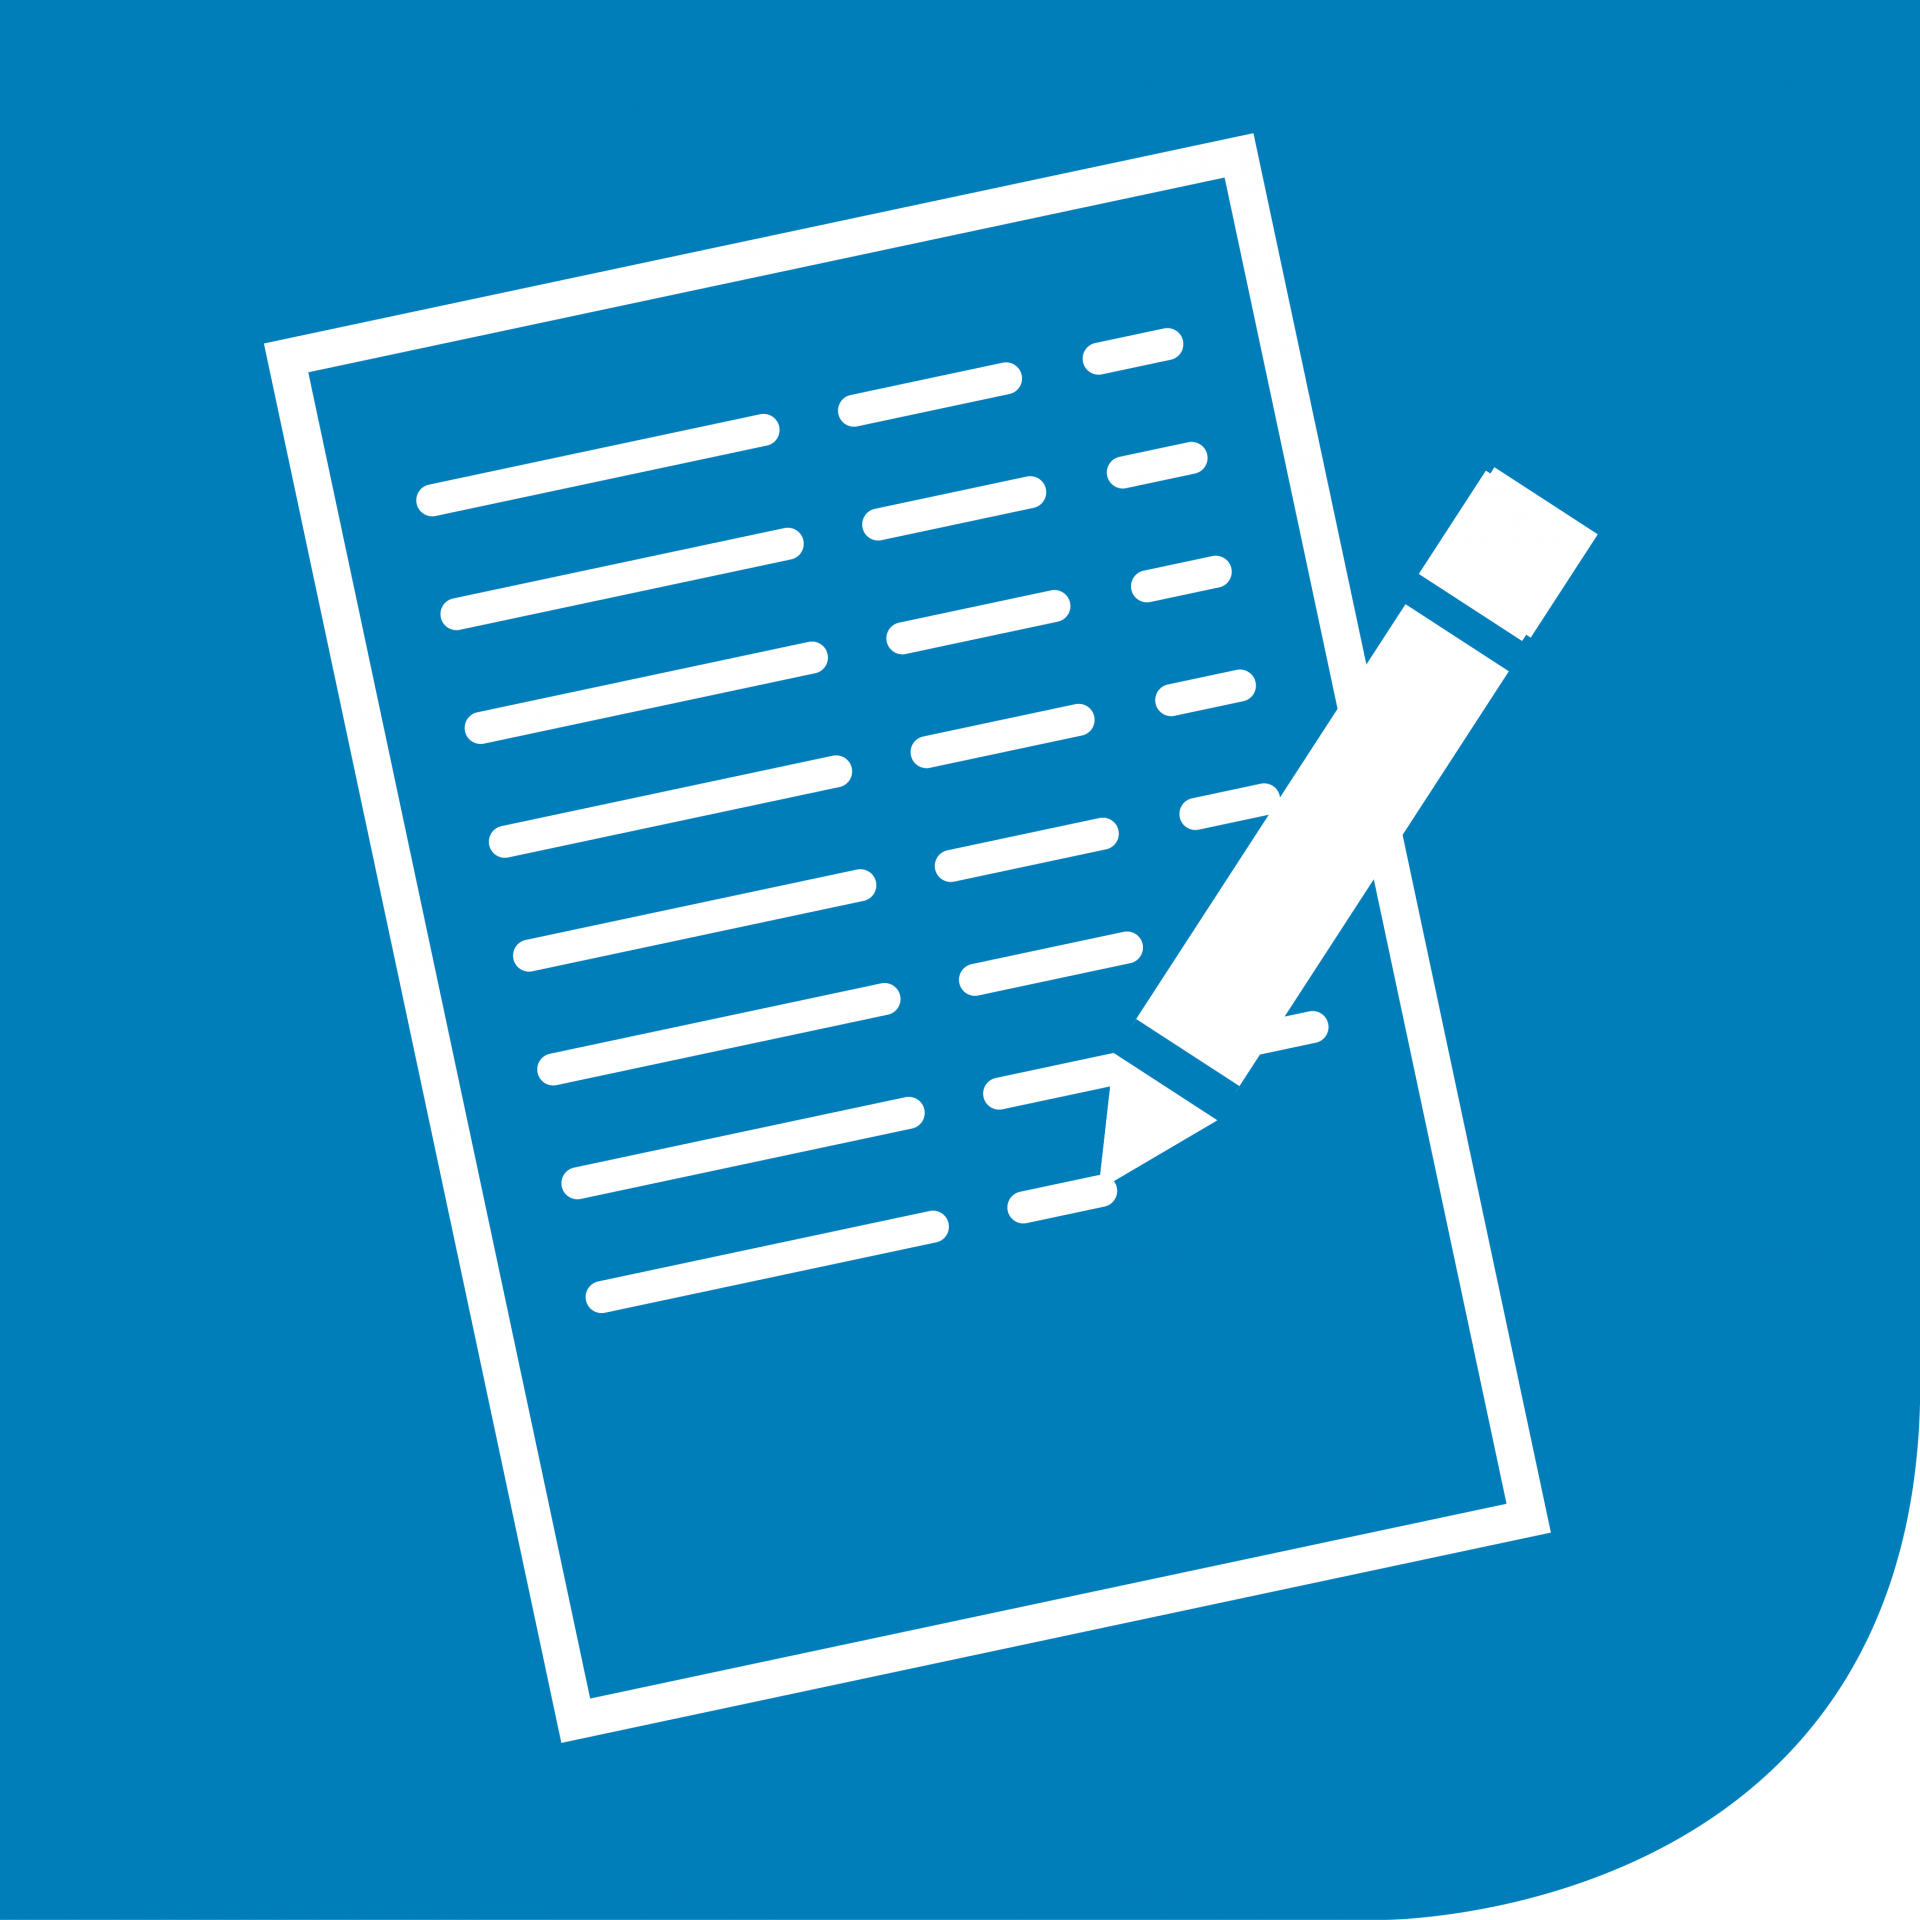 Piktogramm-Daten-erfassen